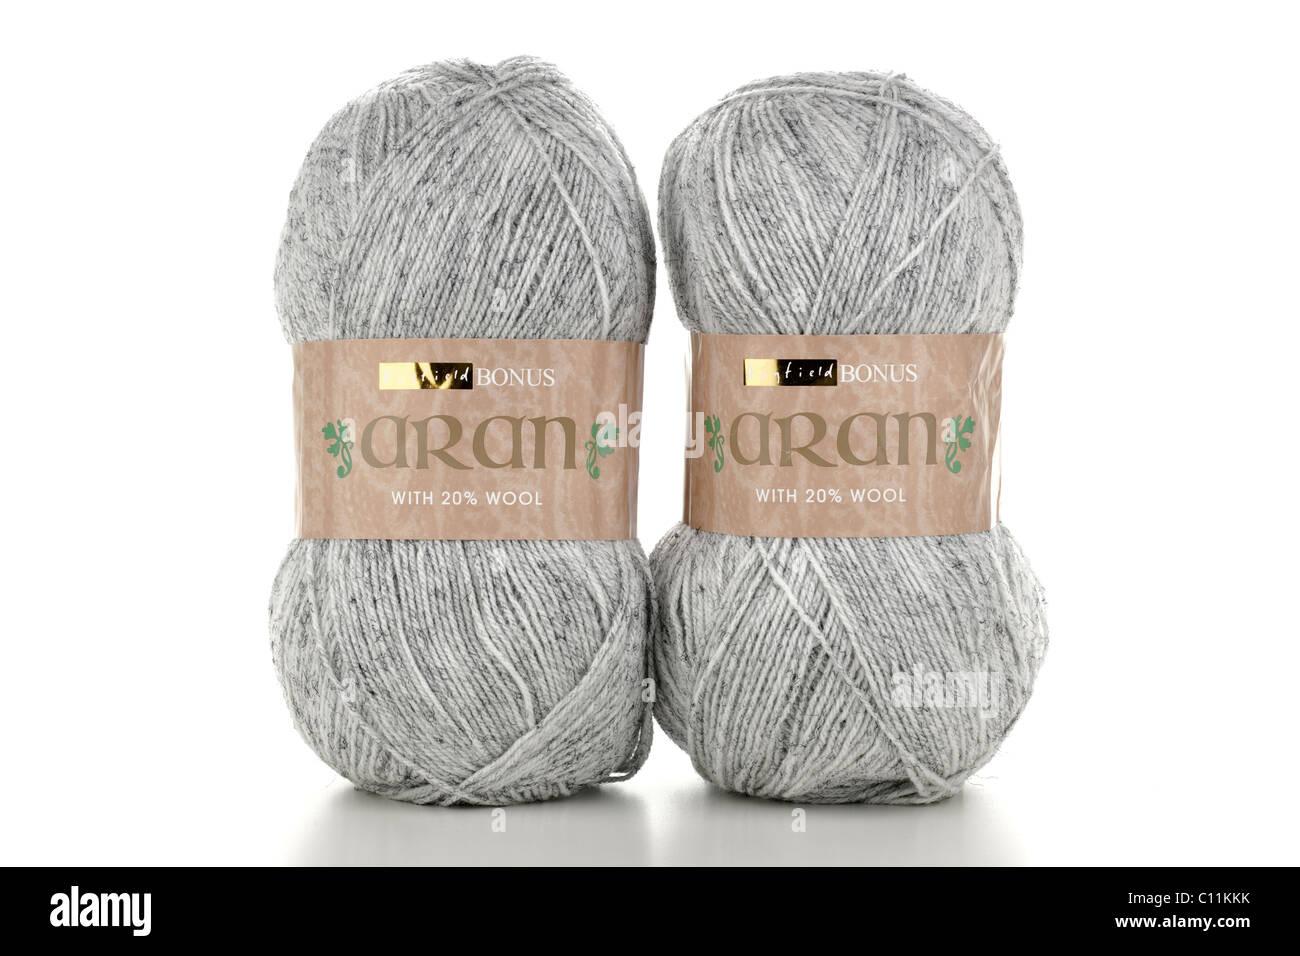 Two 400 gram balls of Hayfield Aran grey white flecked wool - Stock Image